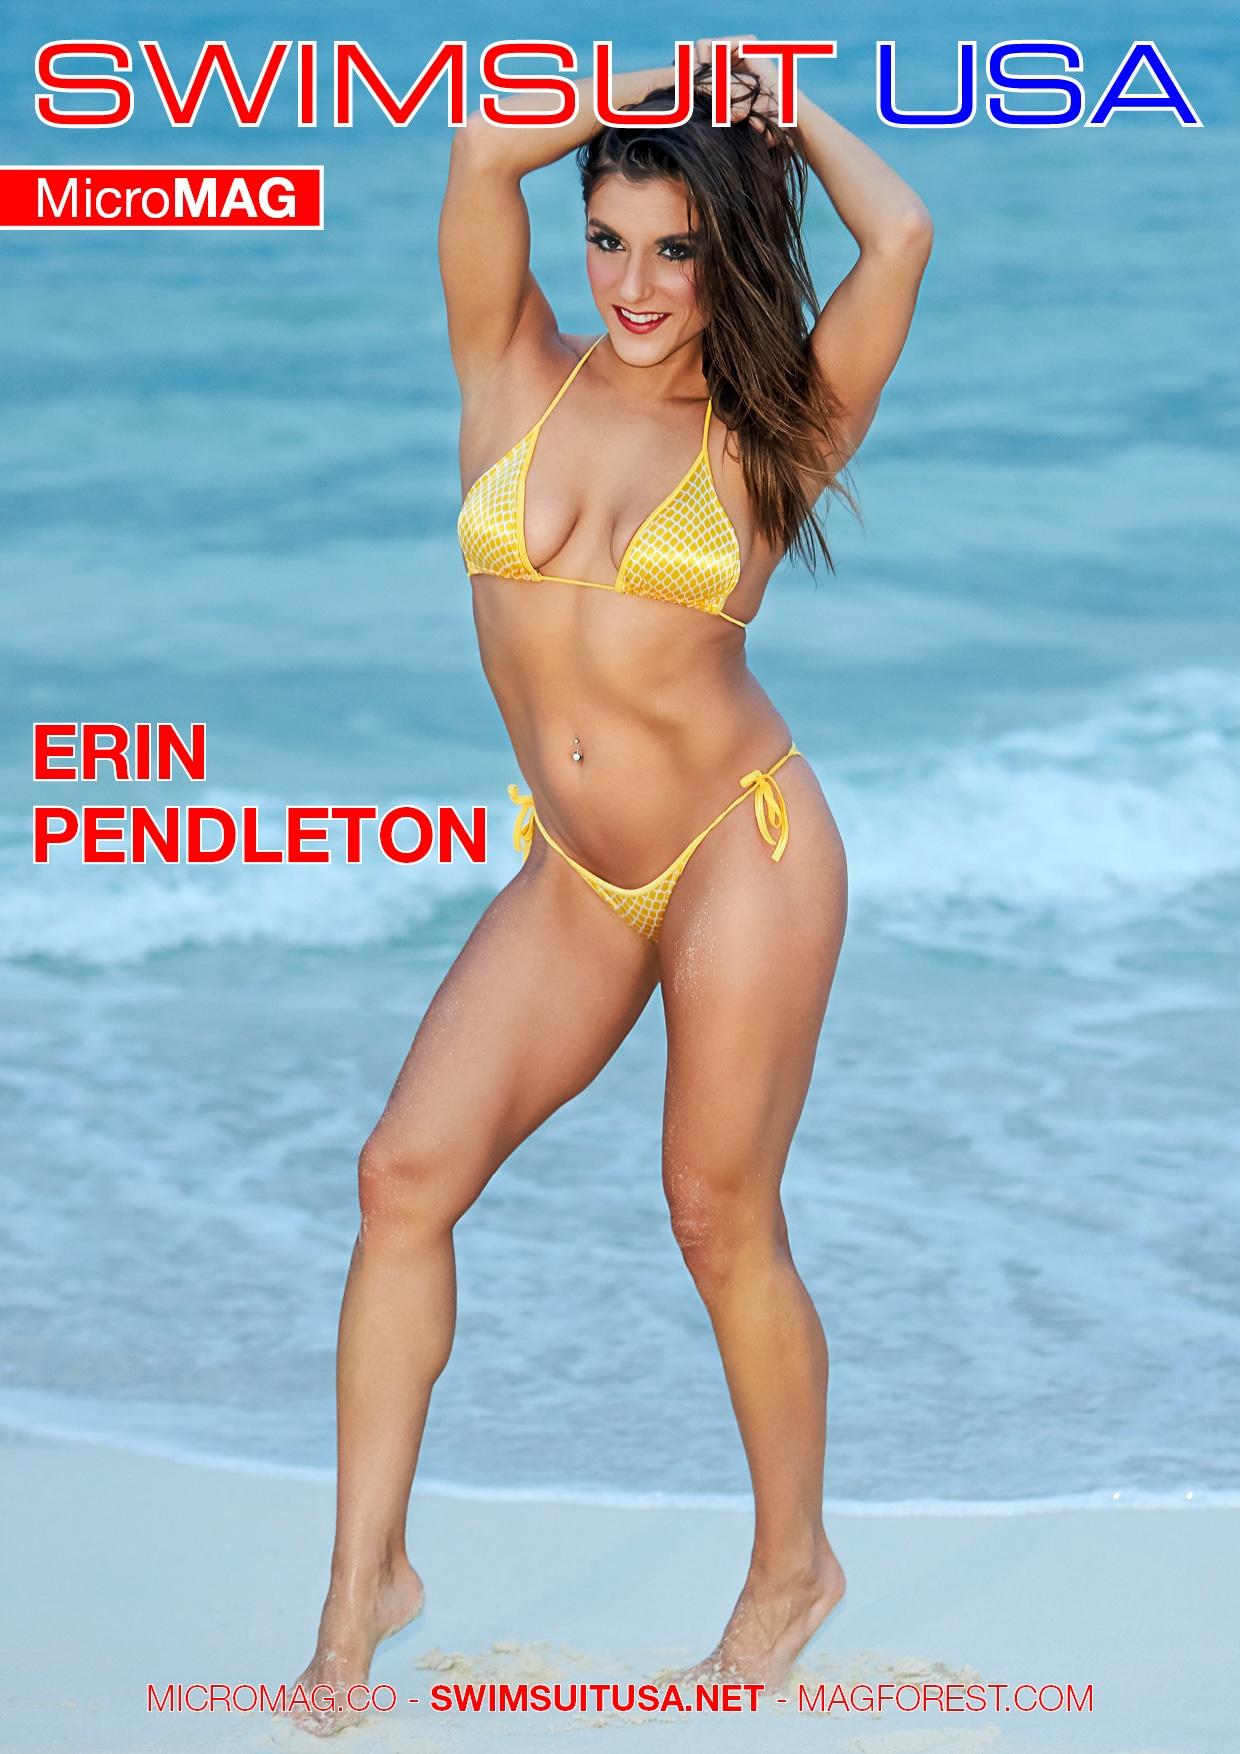 Swimsuit USA MicroMAG - Erin Pendleton